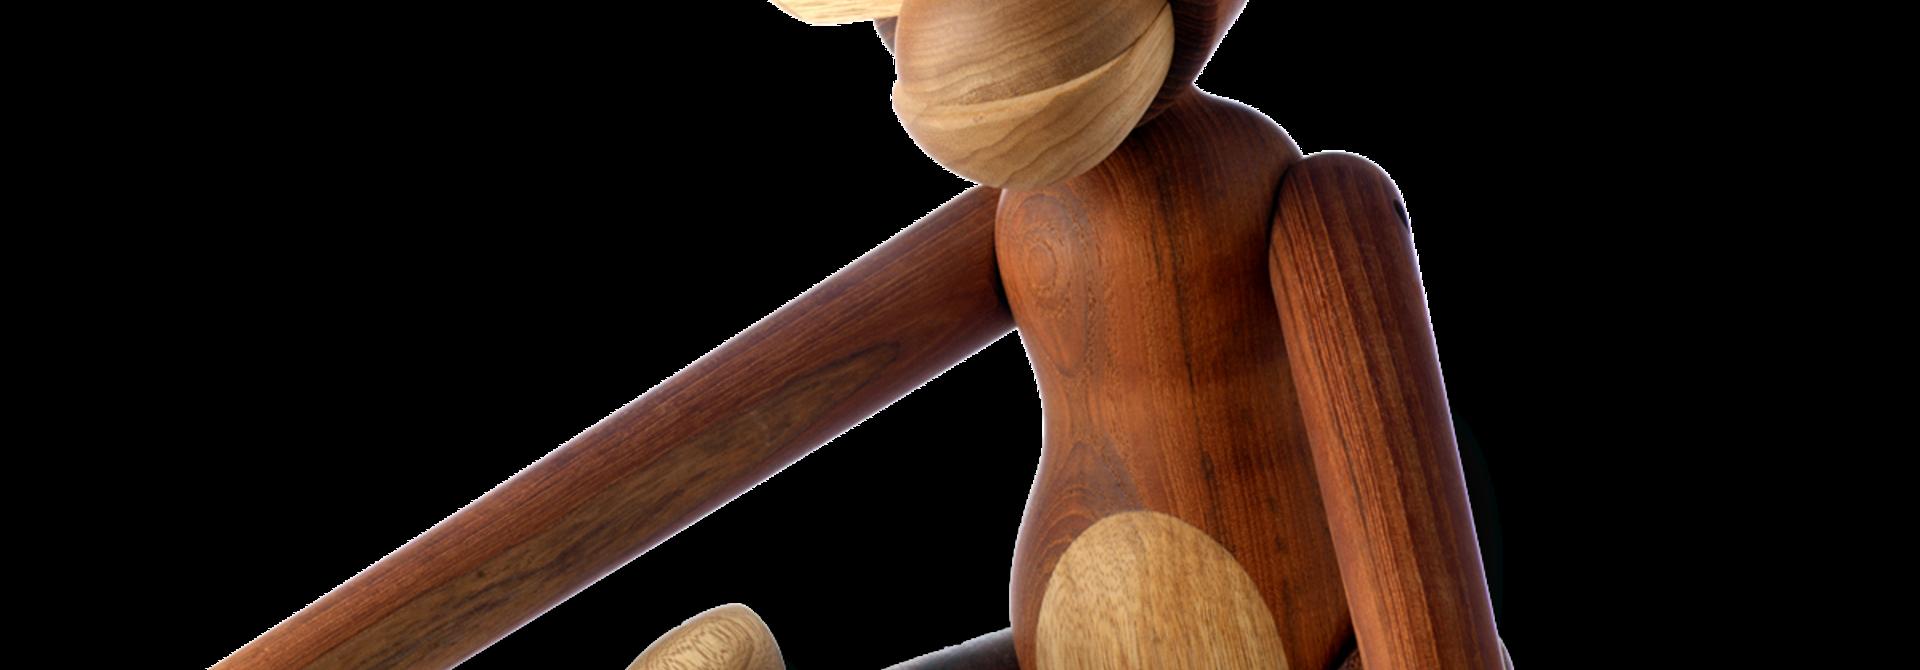 Monkey - Medium - 28cm Teak and limba